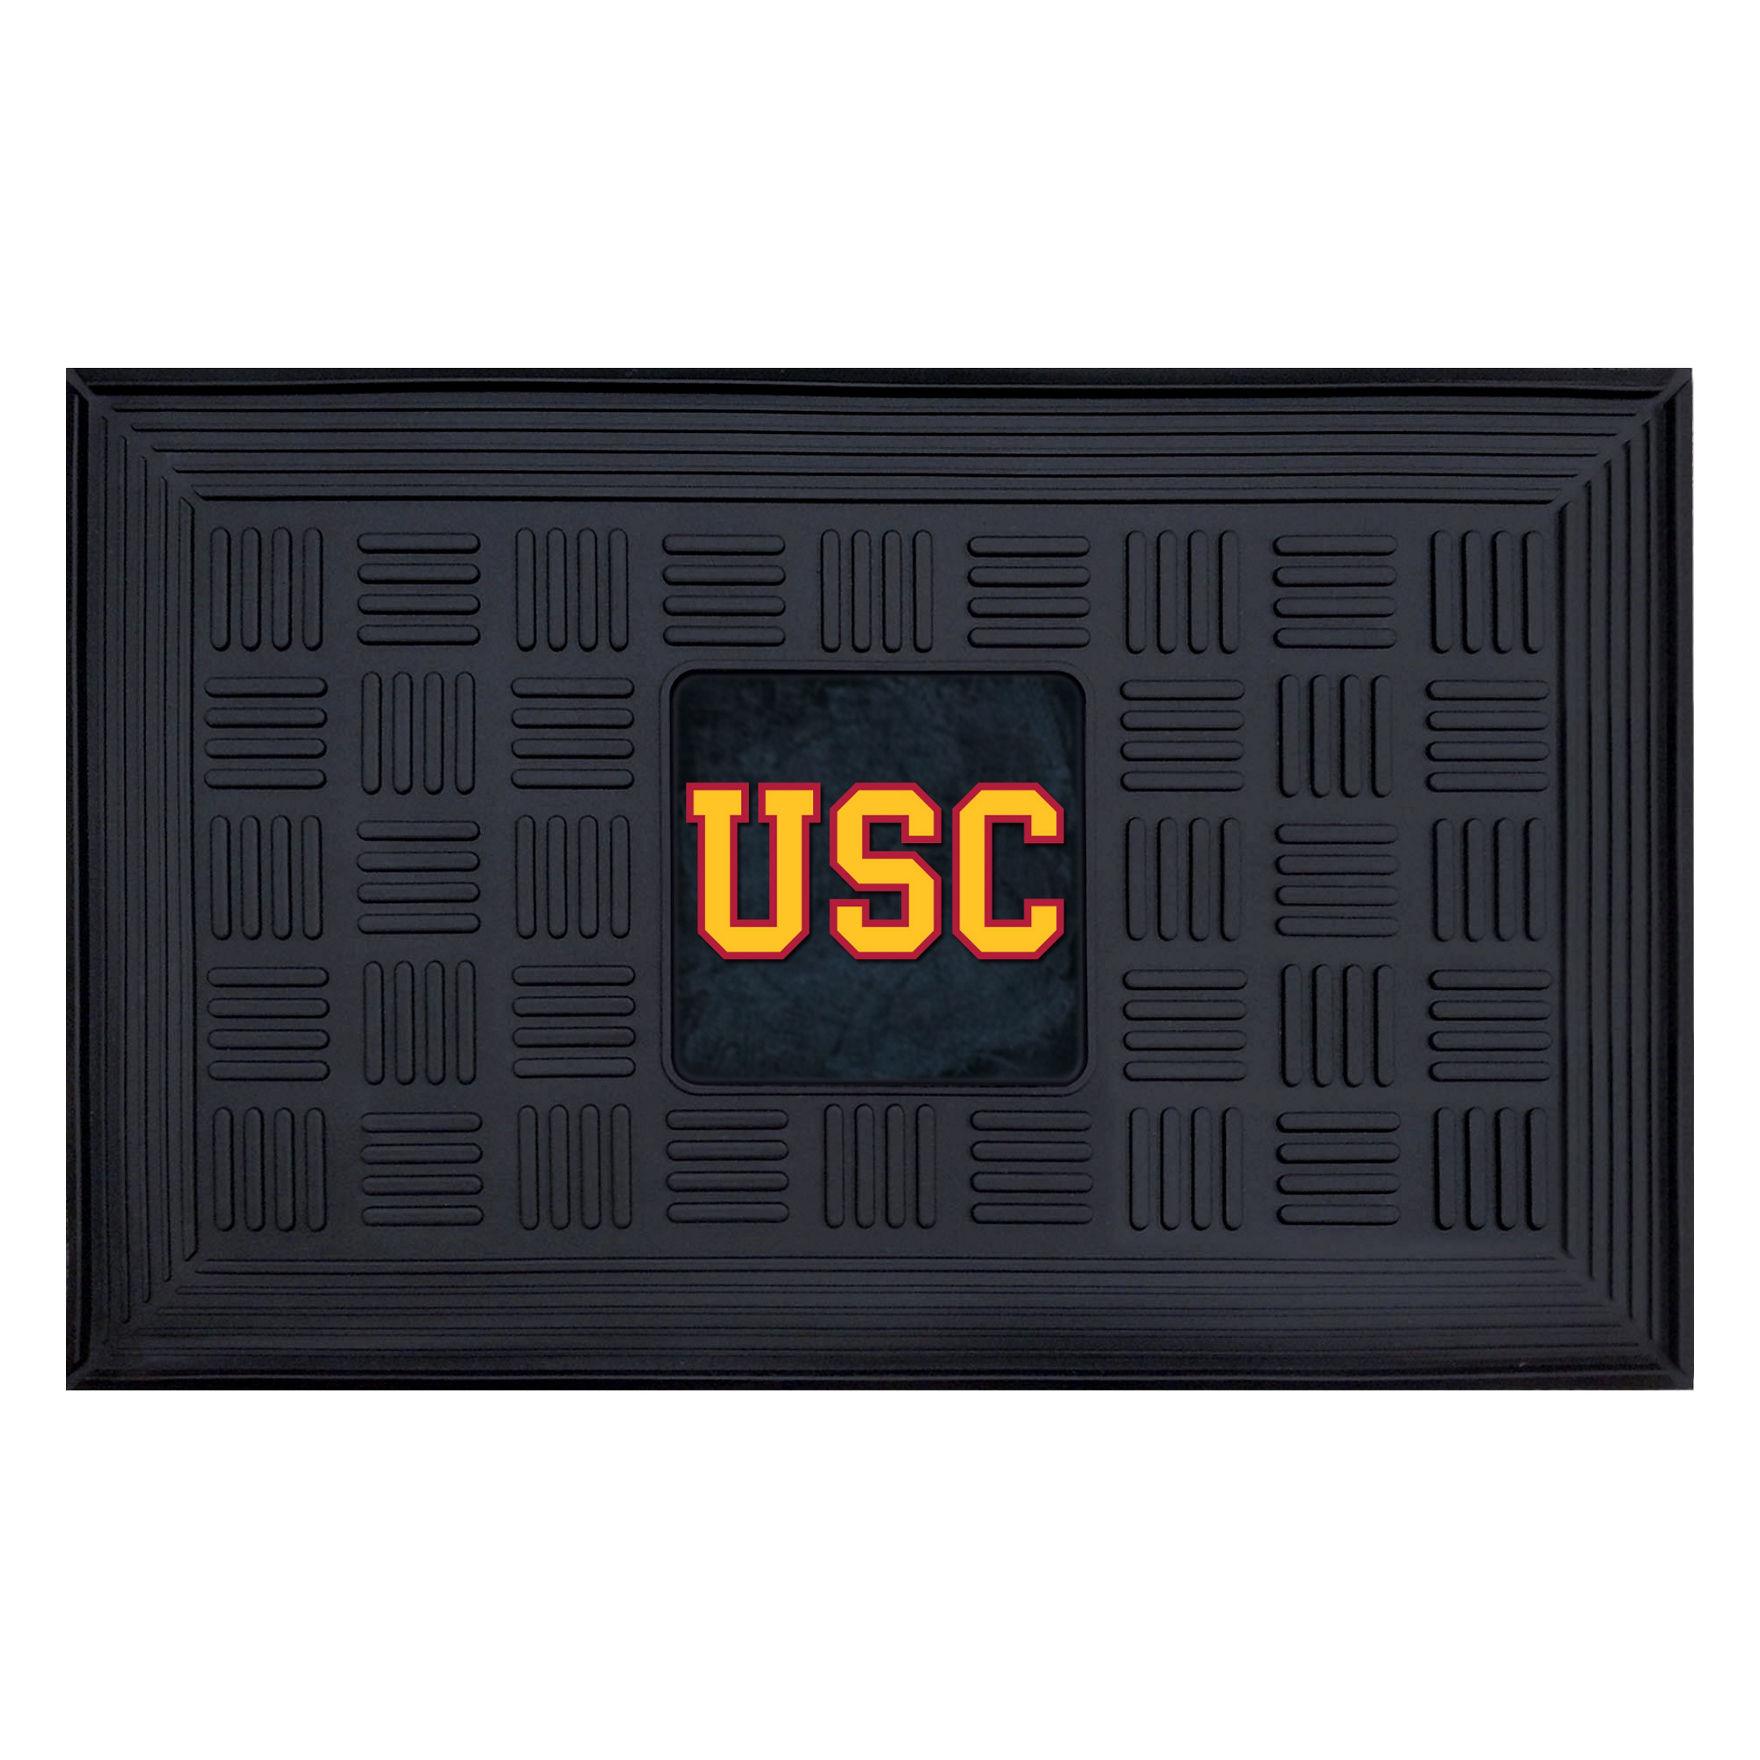 Fanmats Black Outdoor Rugs & Doormats NCAA Outdoor Decor Rugs